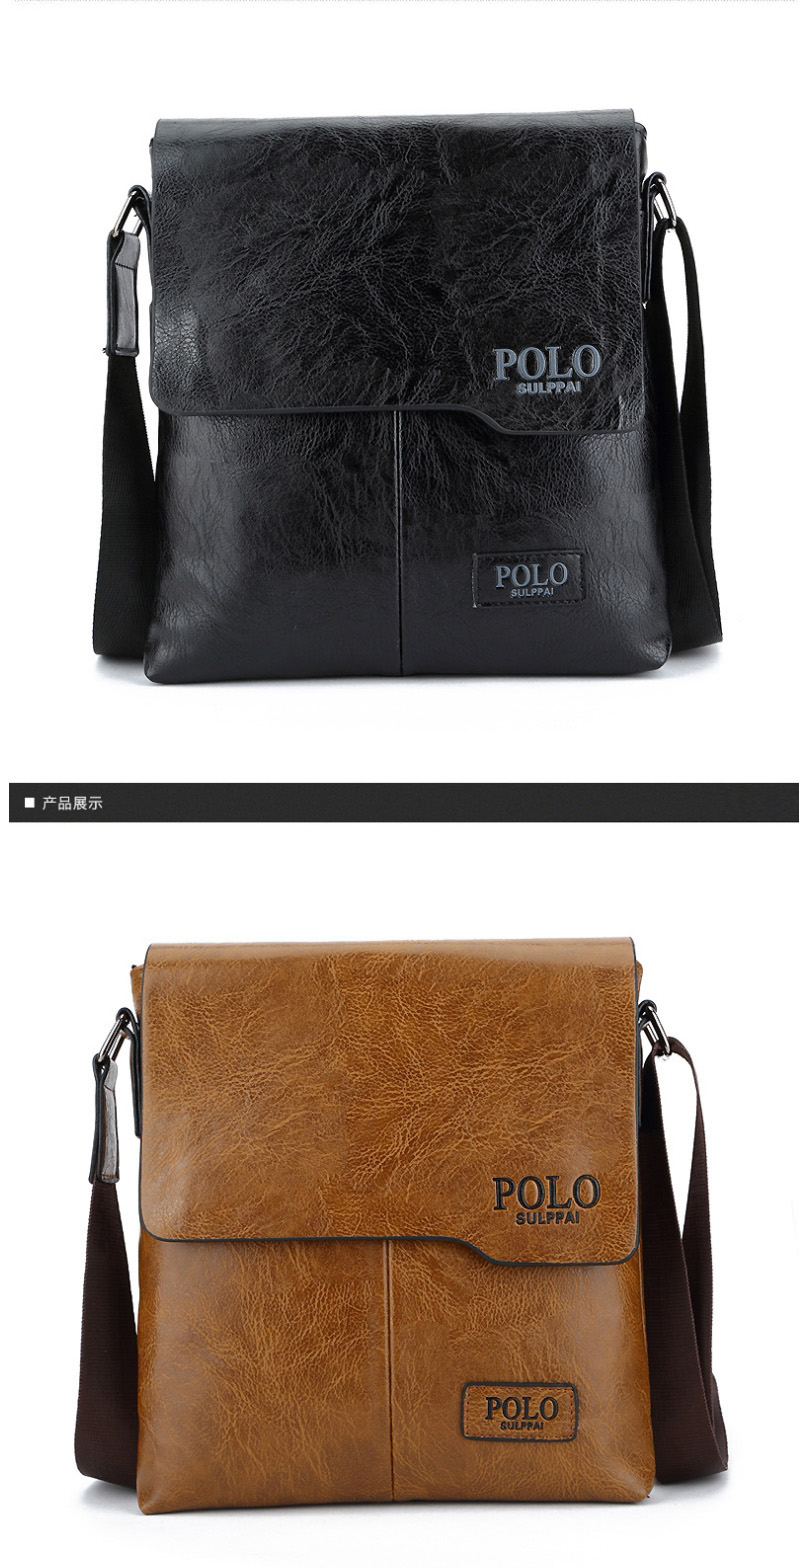 29eae45e44ab Designer POLO Bags Hot Sale Messenger Bag Men Leather High Quality  Crossbody Man Shoulder Bag. NB402 01 NB402 02 ...